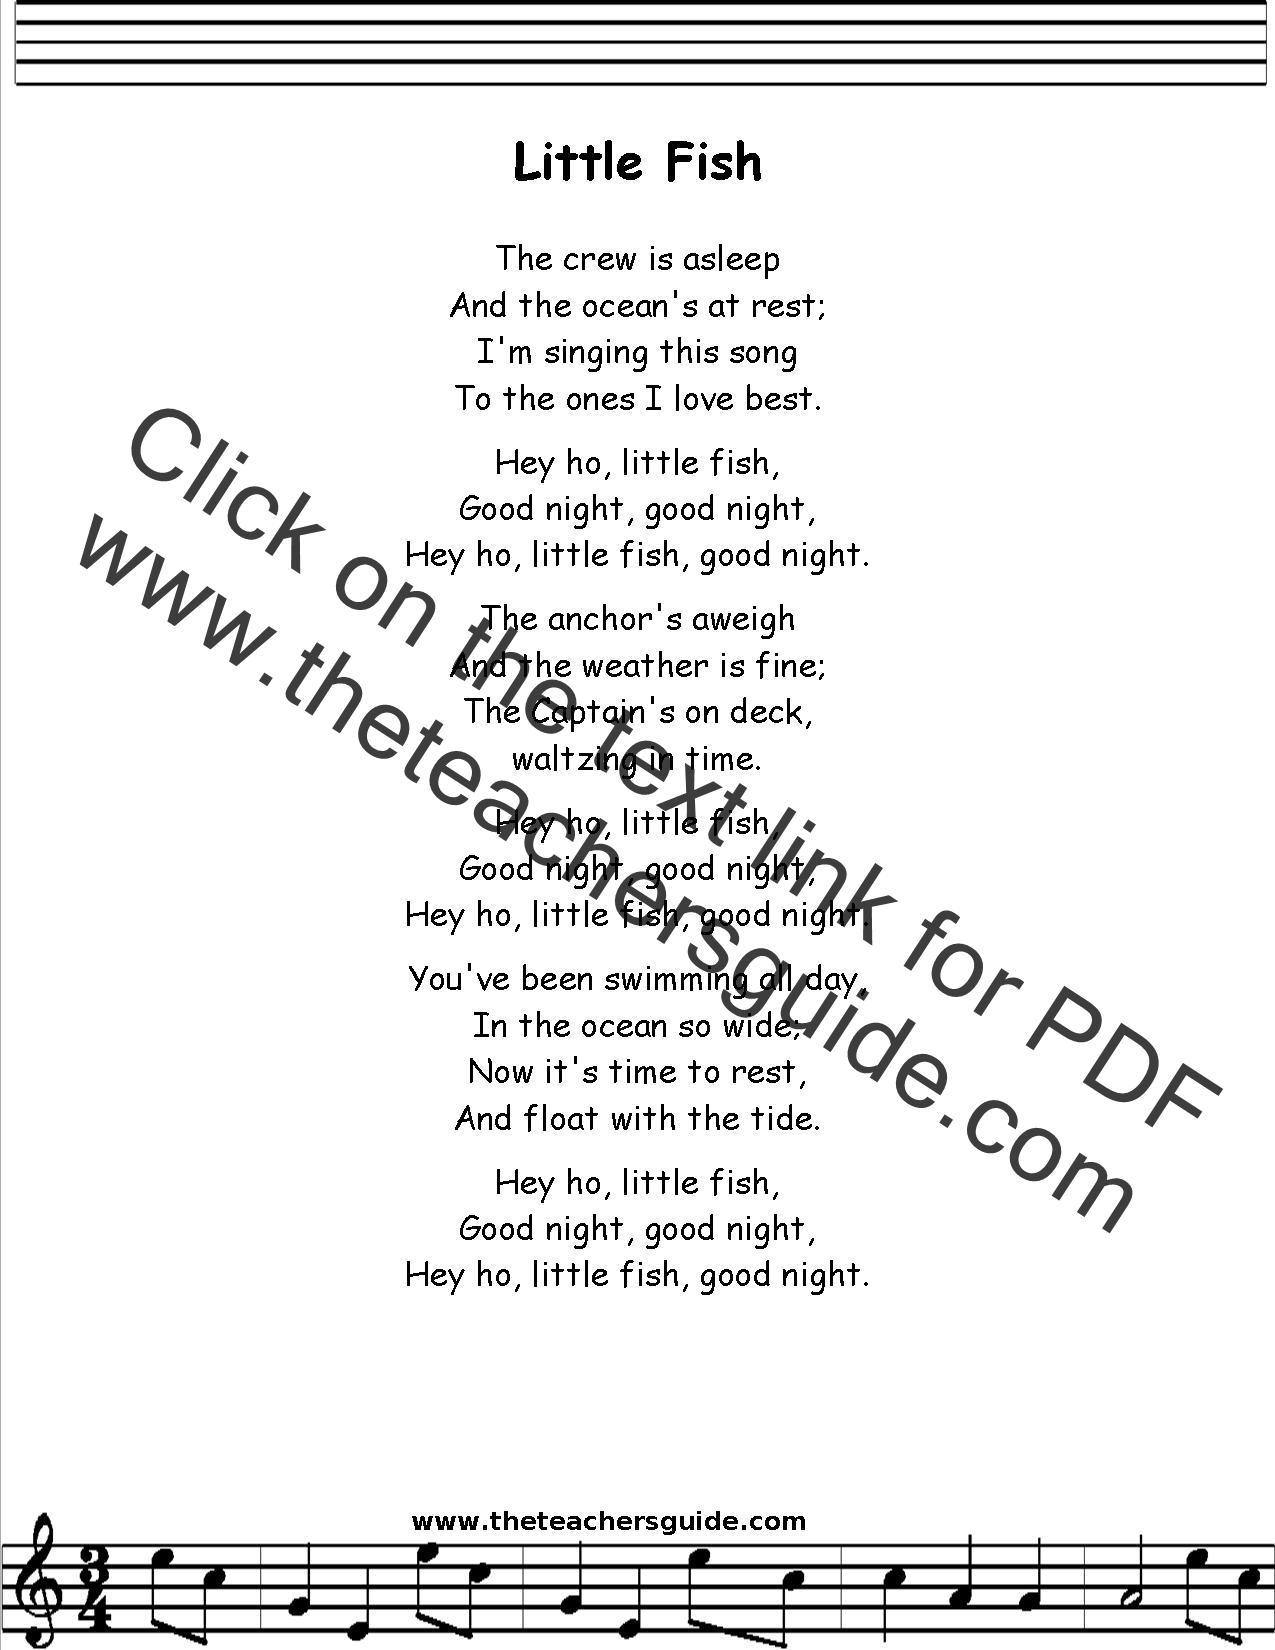 little fish lyrics printout midi and video